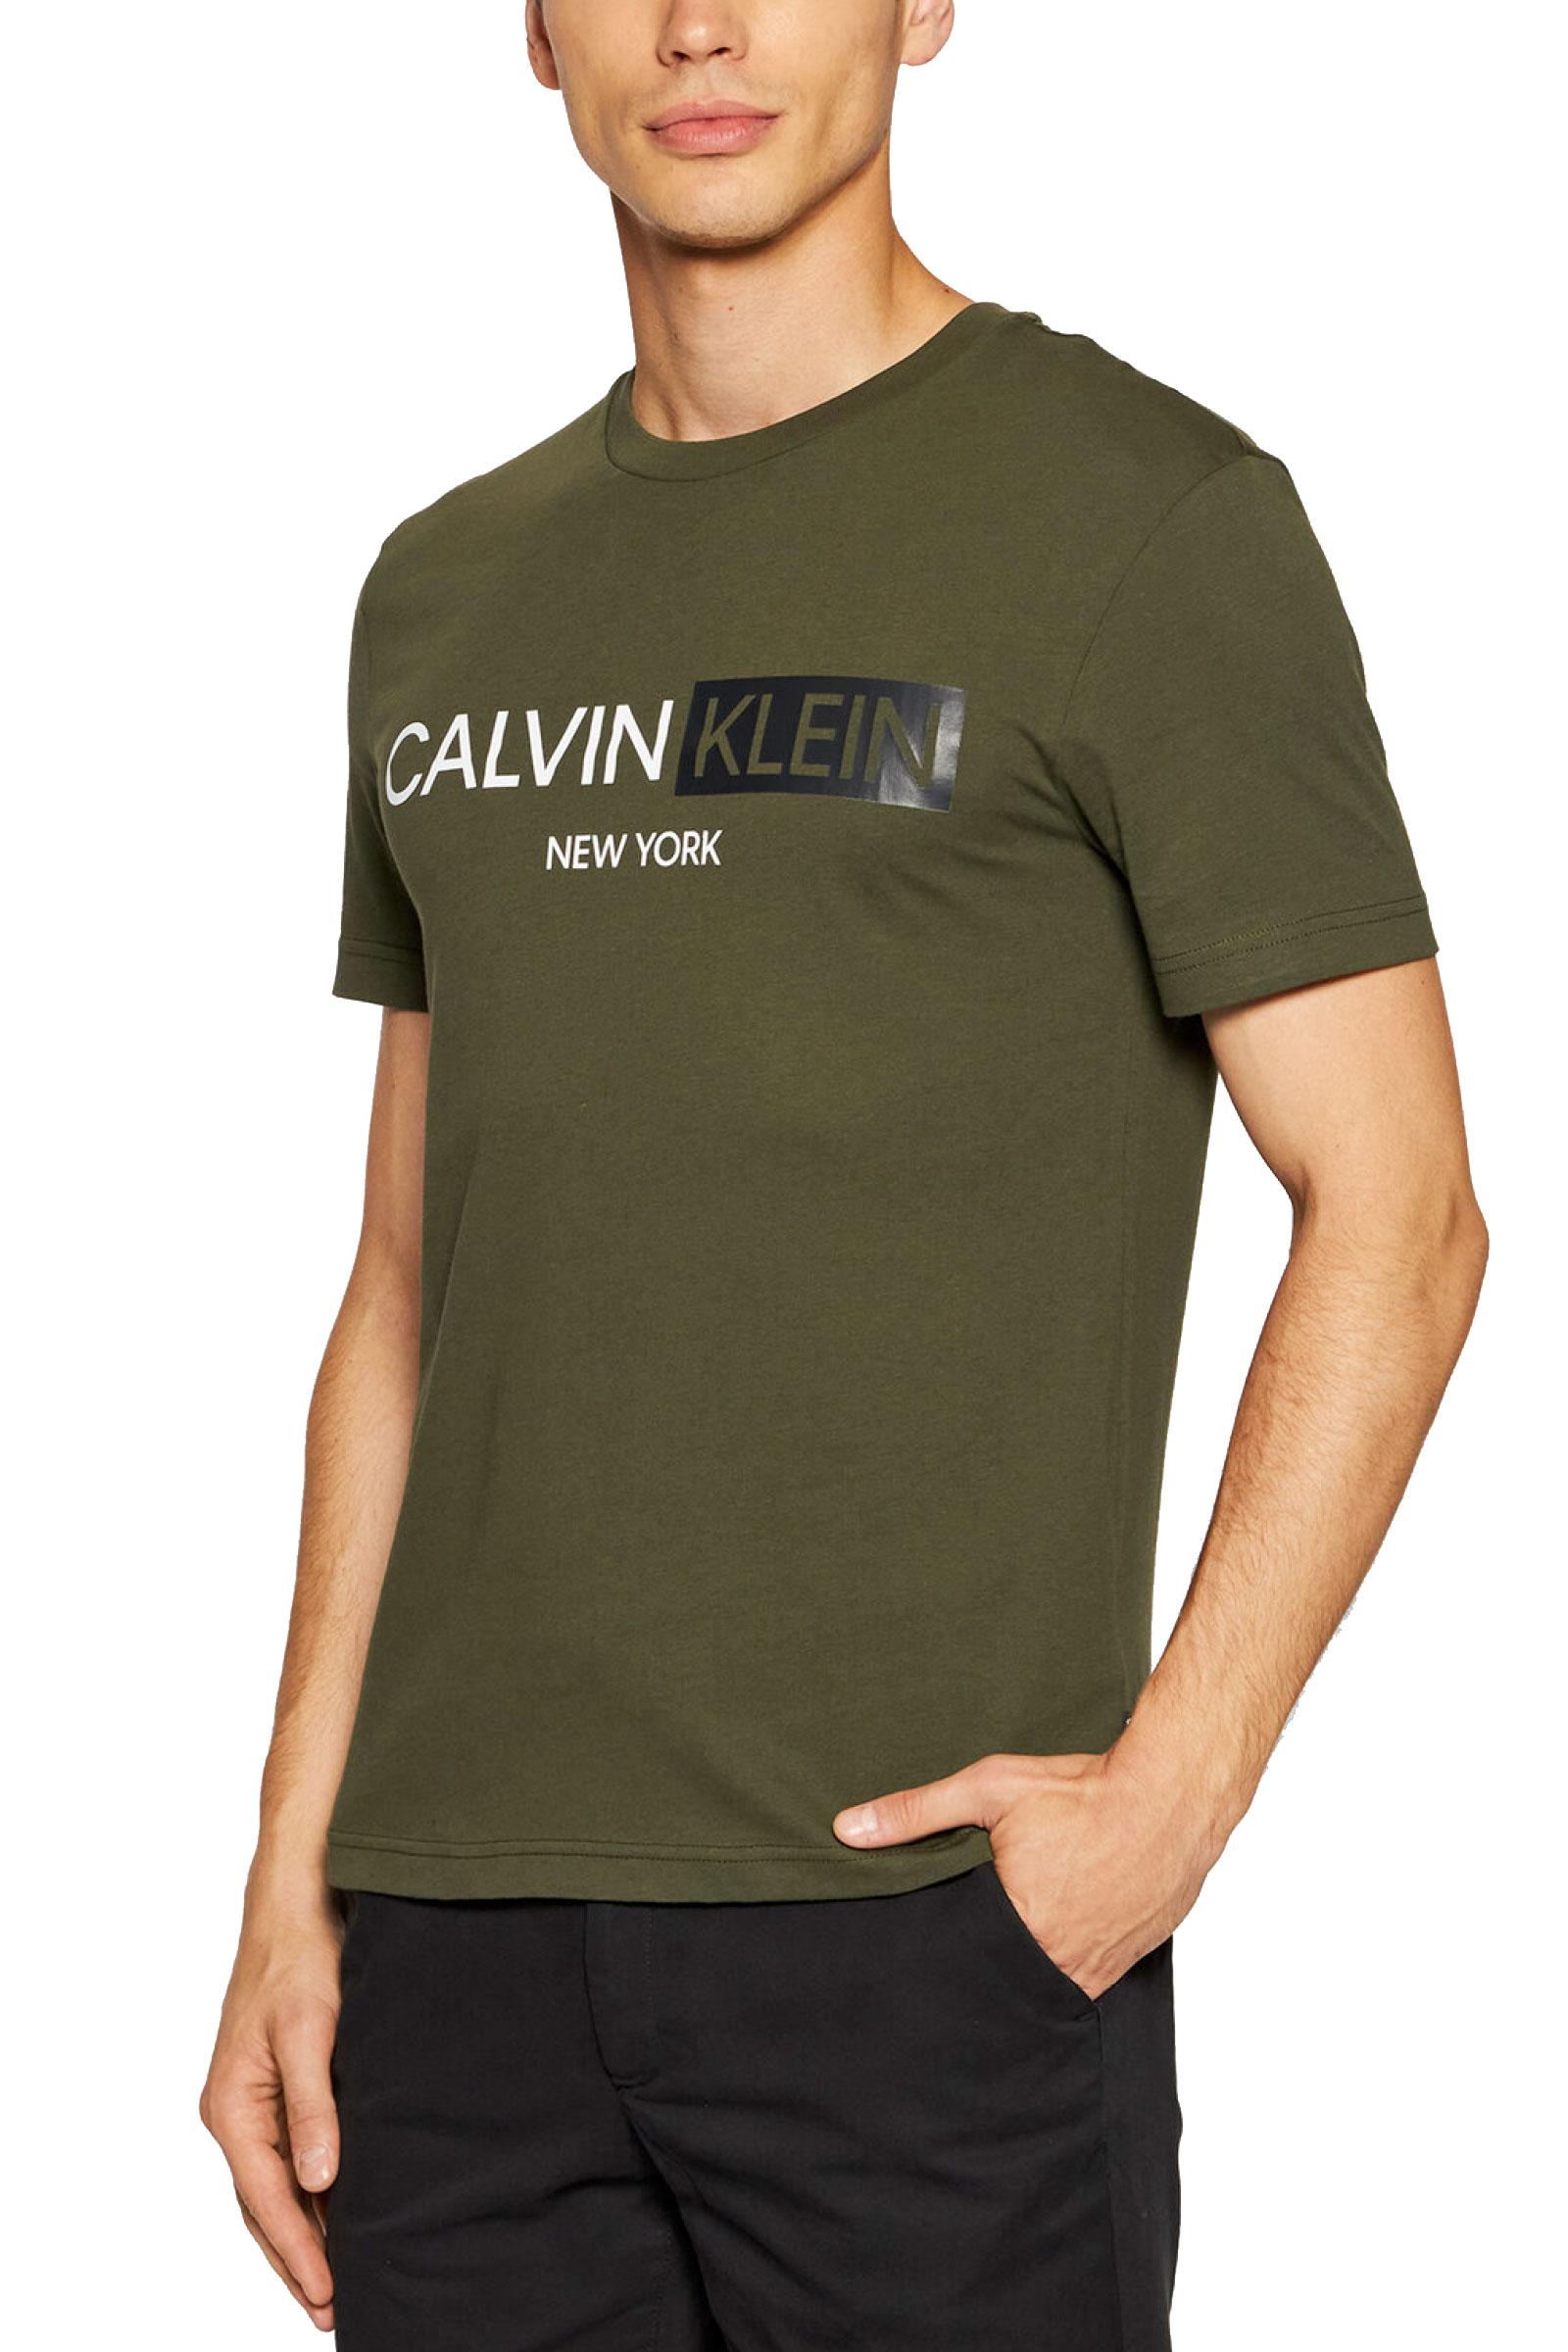 T-Shirt Uomo CALVIN KLEIN   T-Shirt   K10K107256MRZ